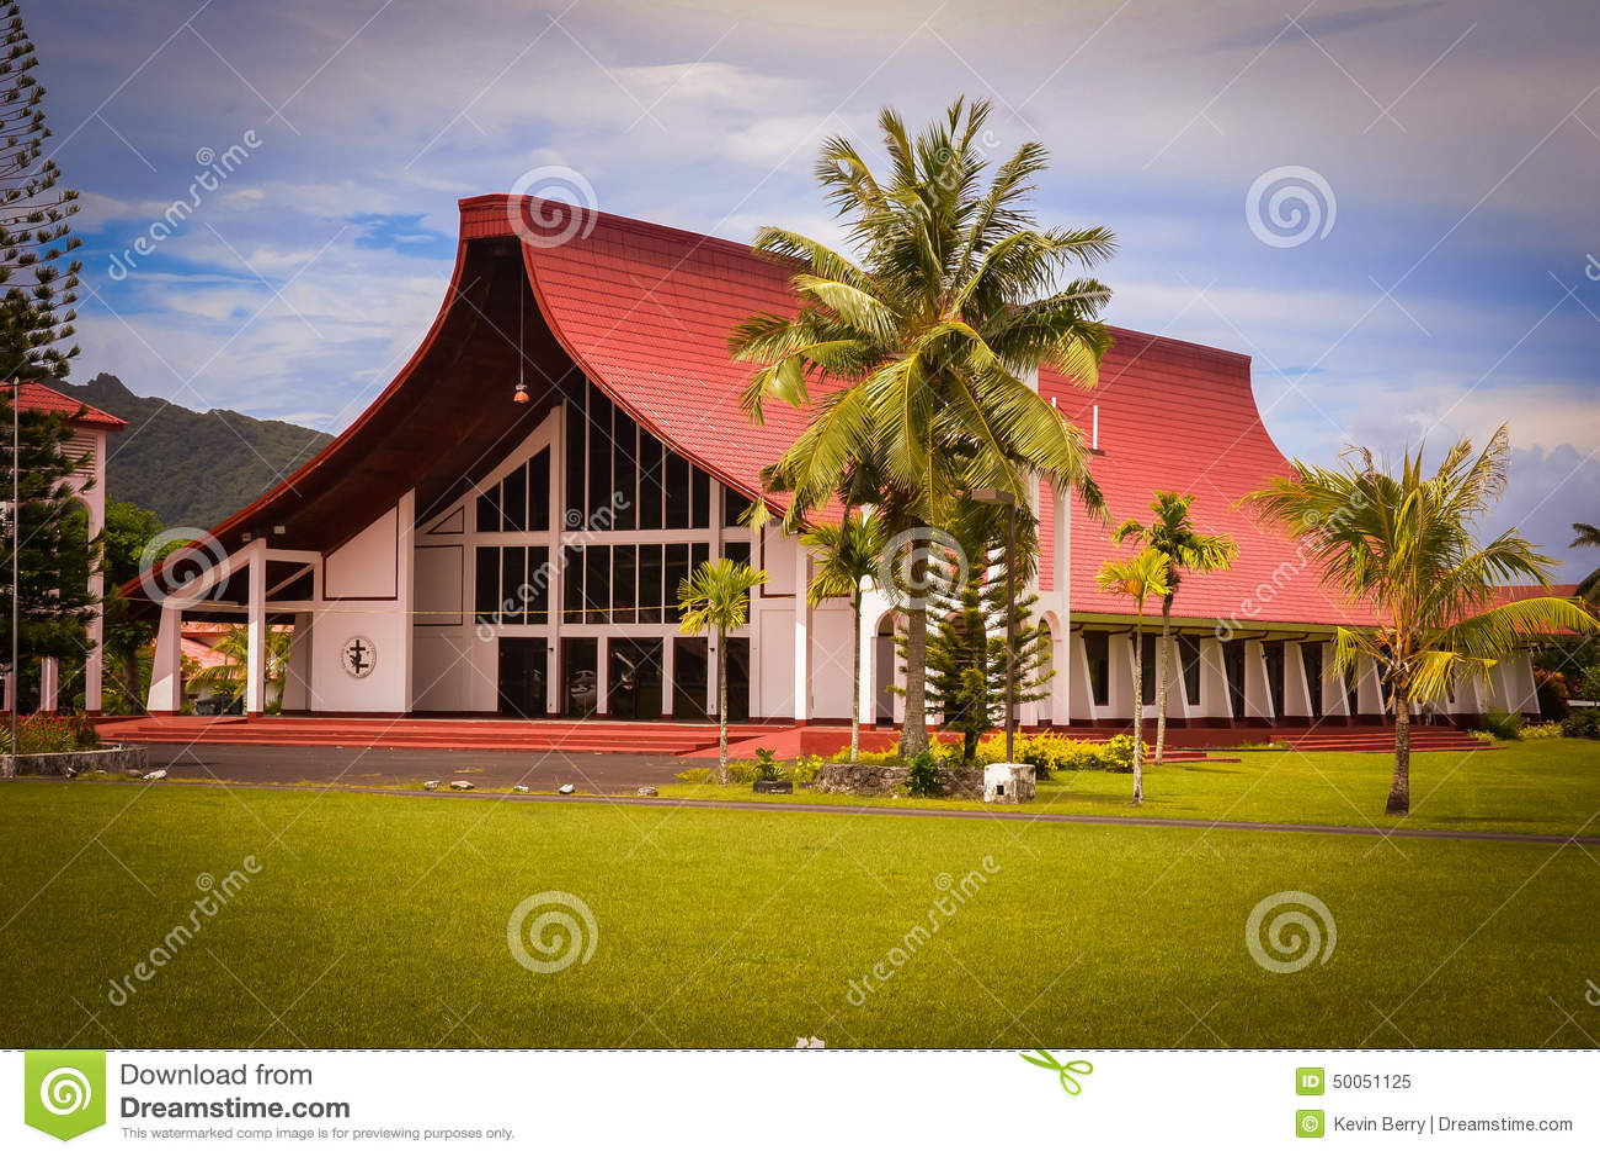 American Samoa Dating Sites